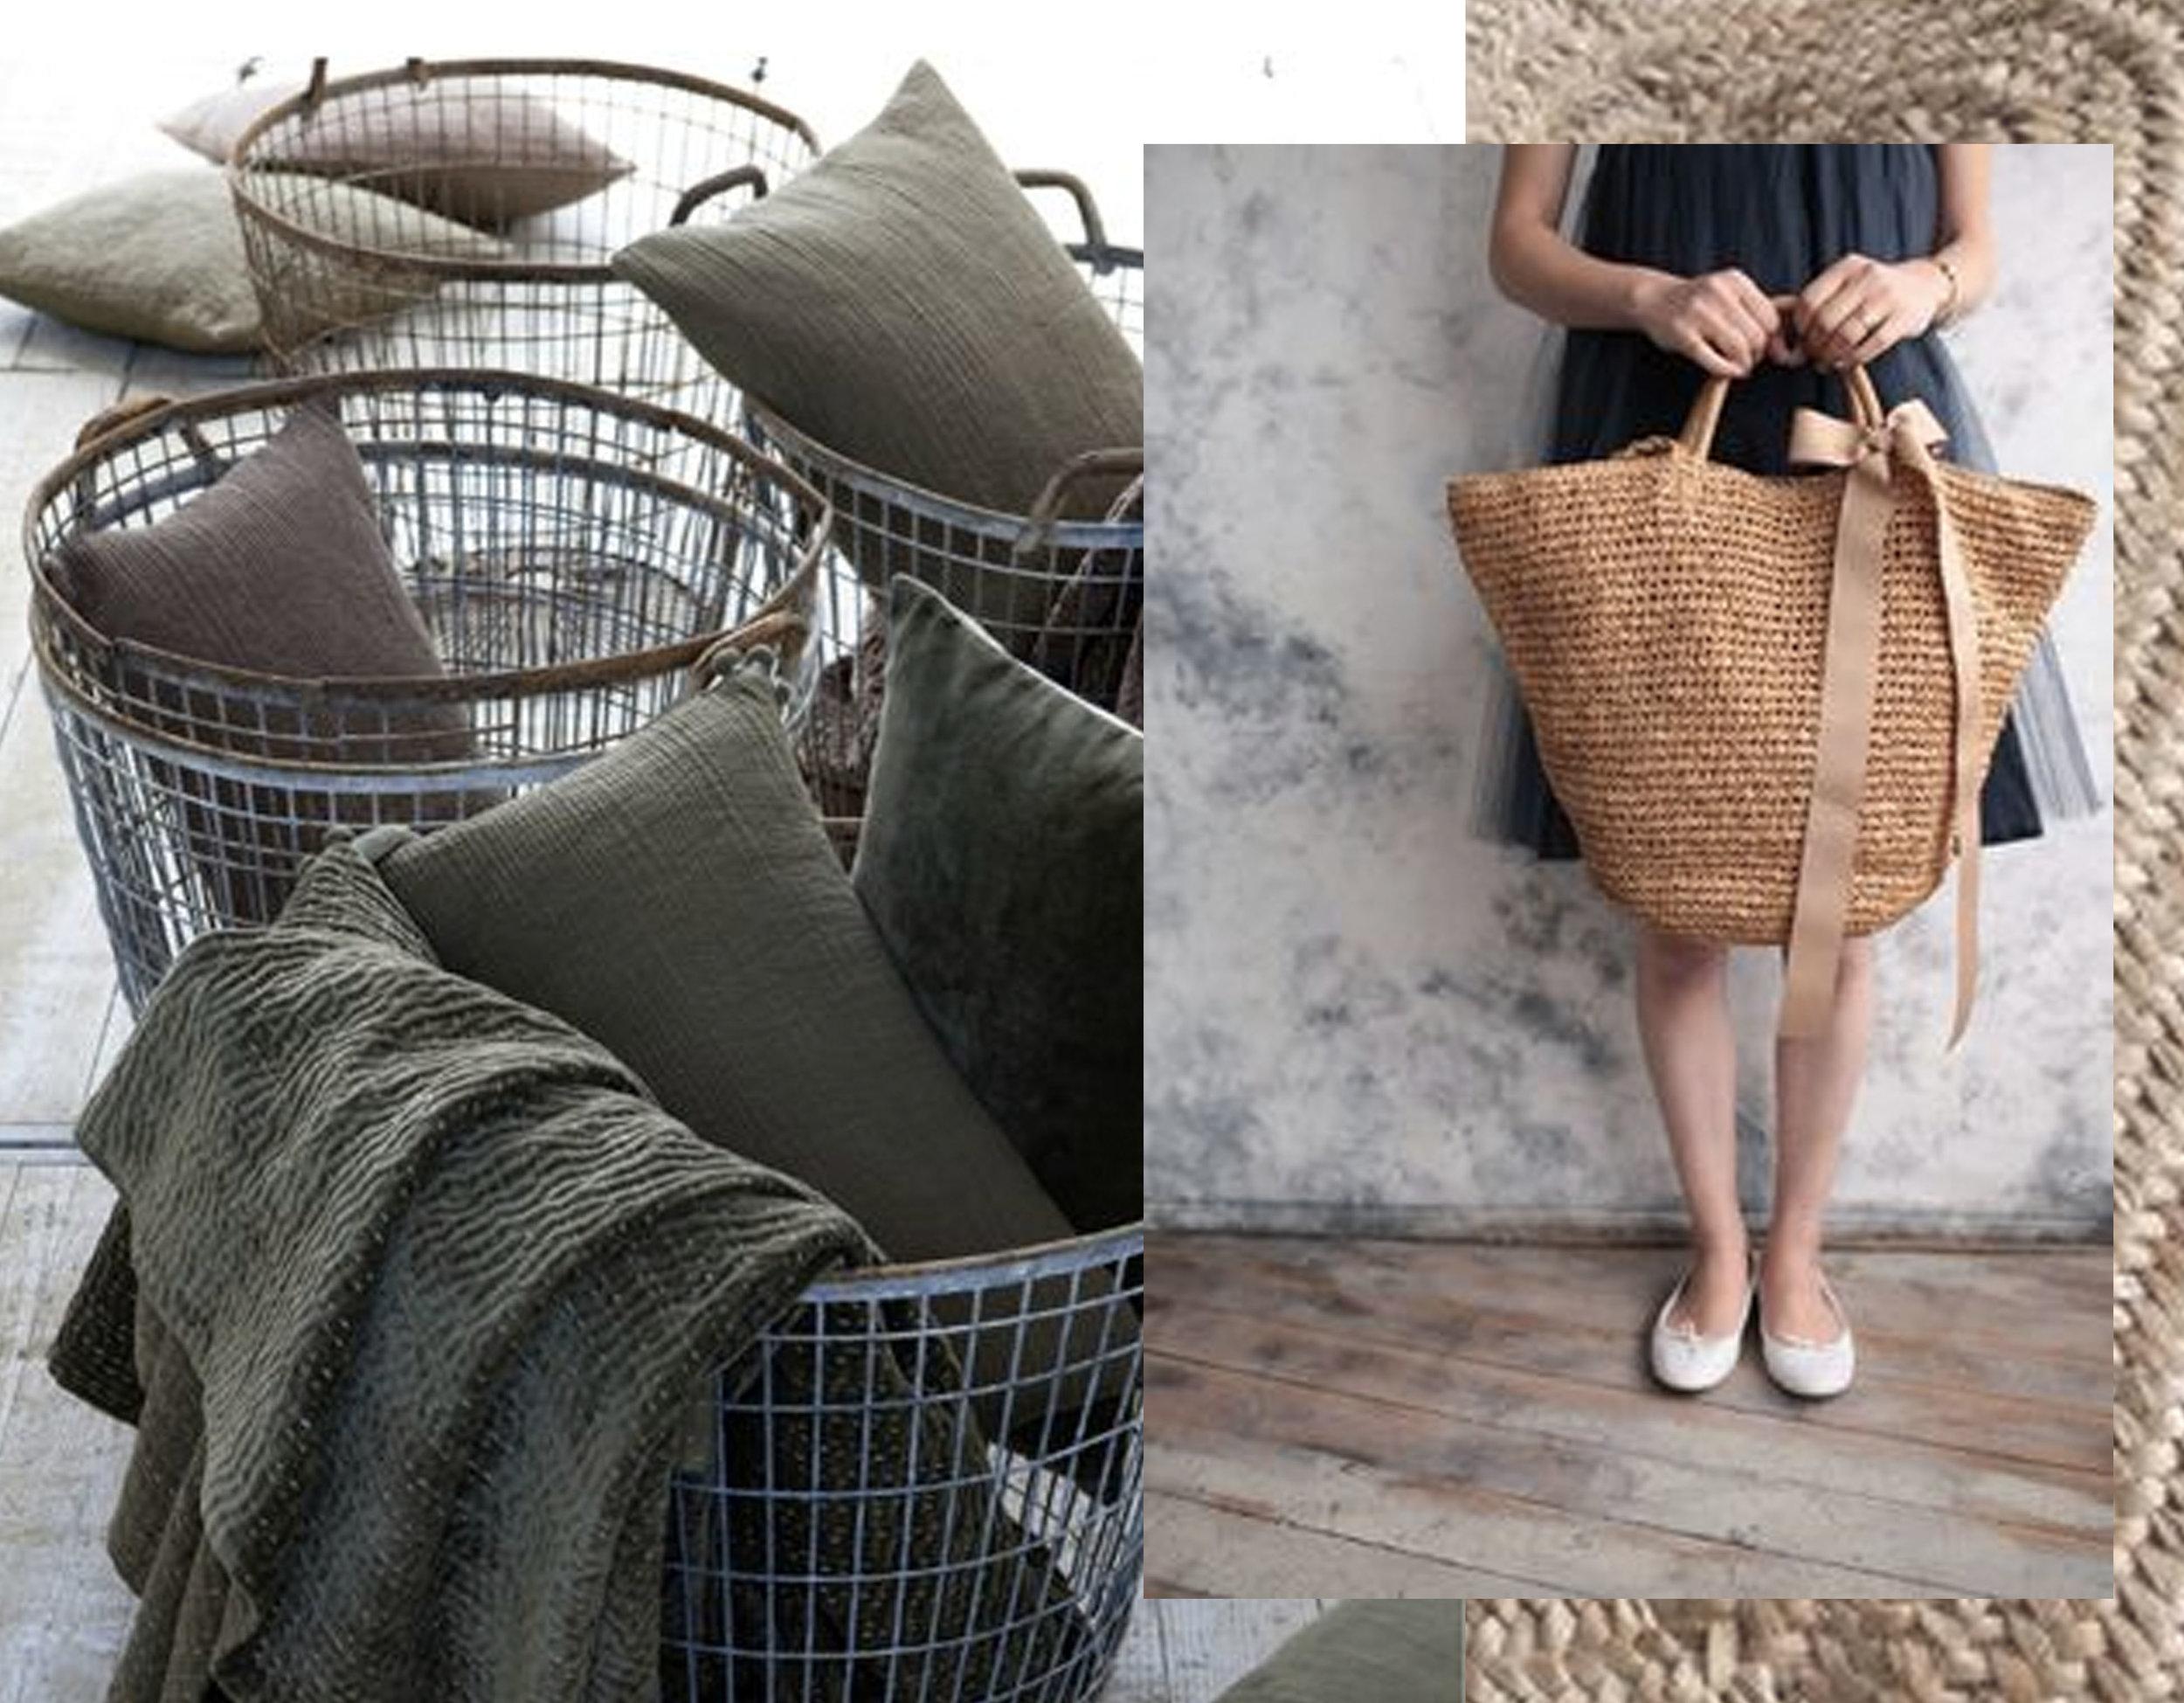 wire baskets via  Pinimg  - handbag via  Elle Est Belle